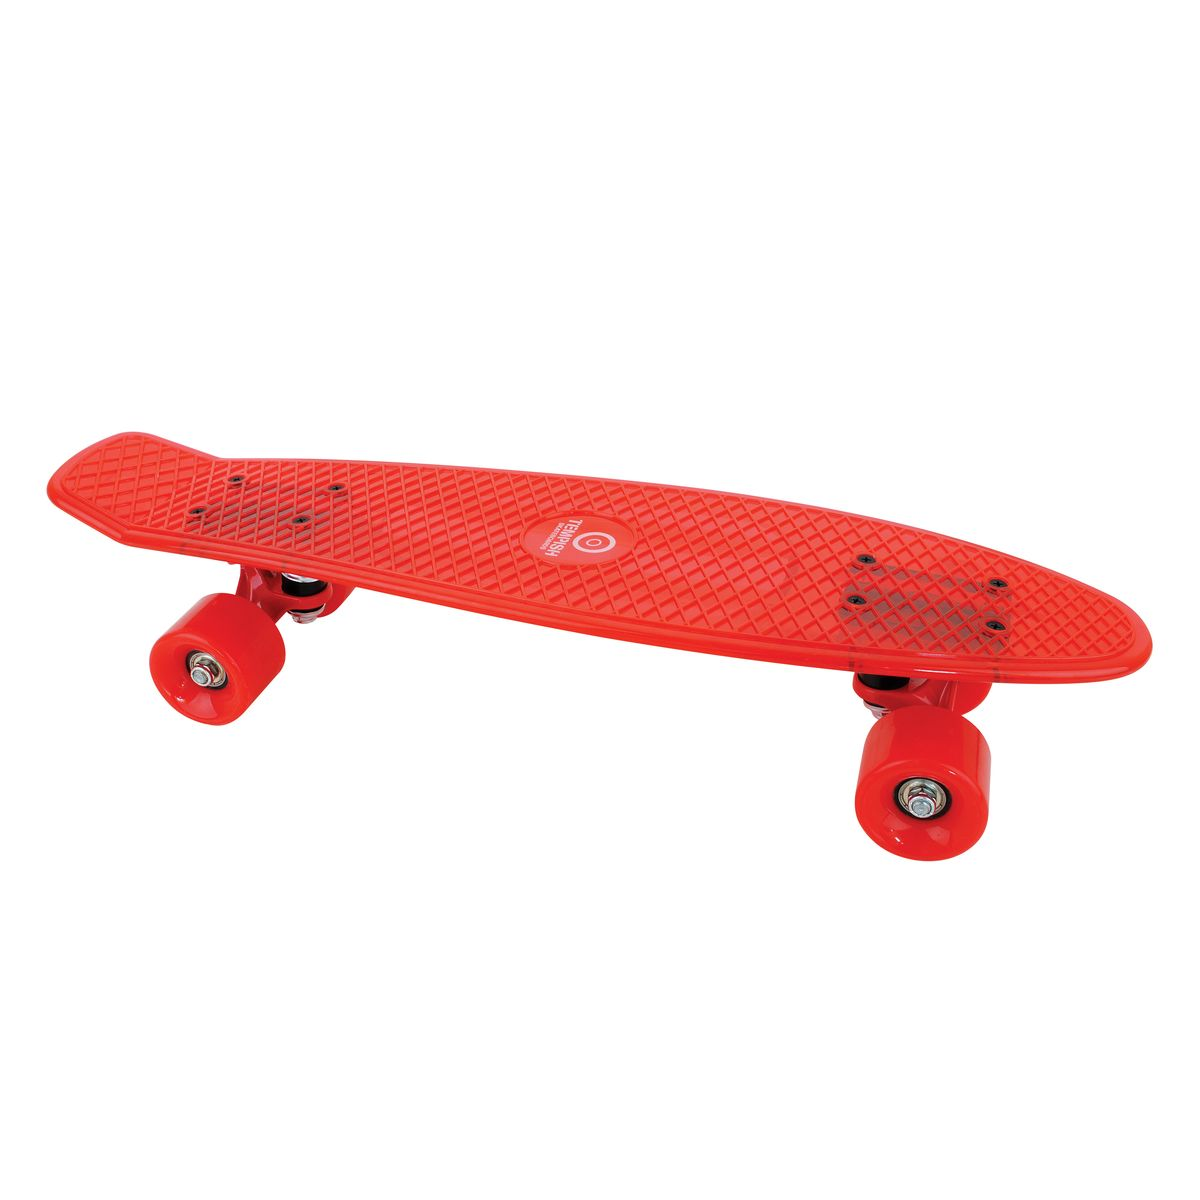 Скейтборд пластиковый Tempish Buffy Star, цвет: красный скейтборд пластиковый tempish buffy sweet цвет розовый